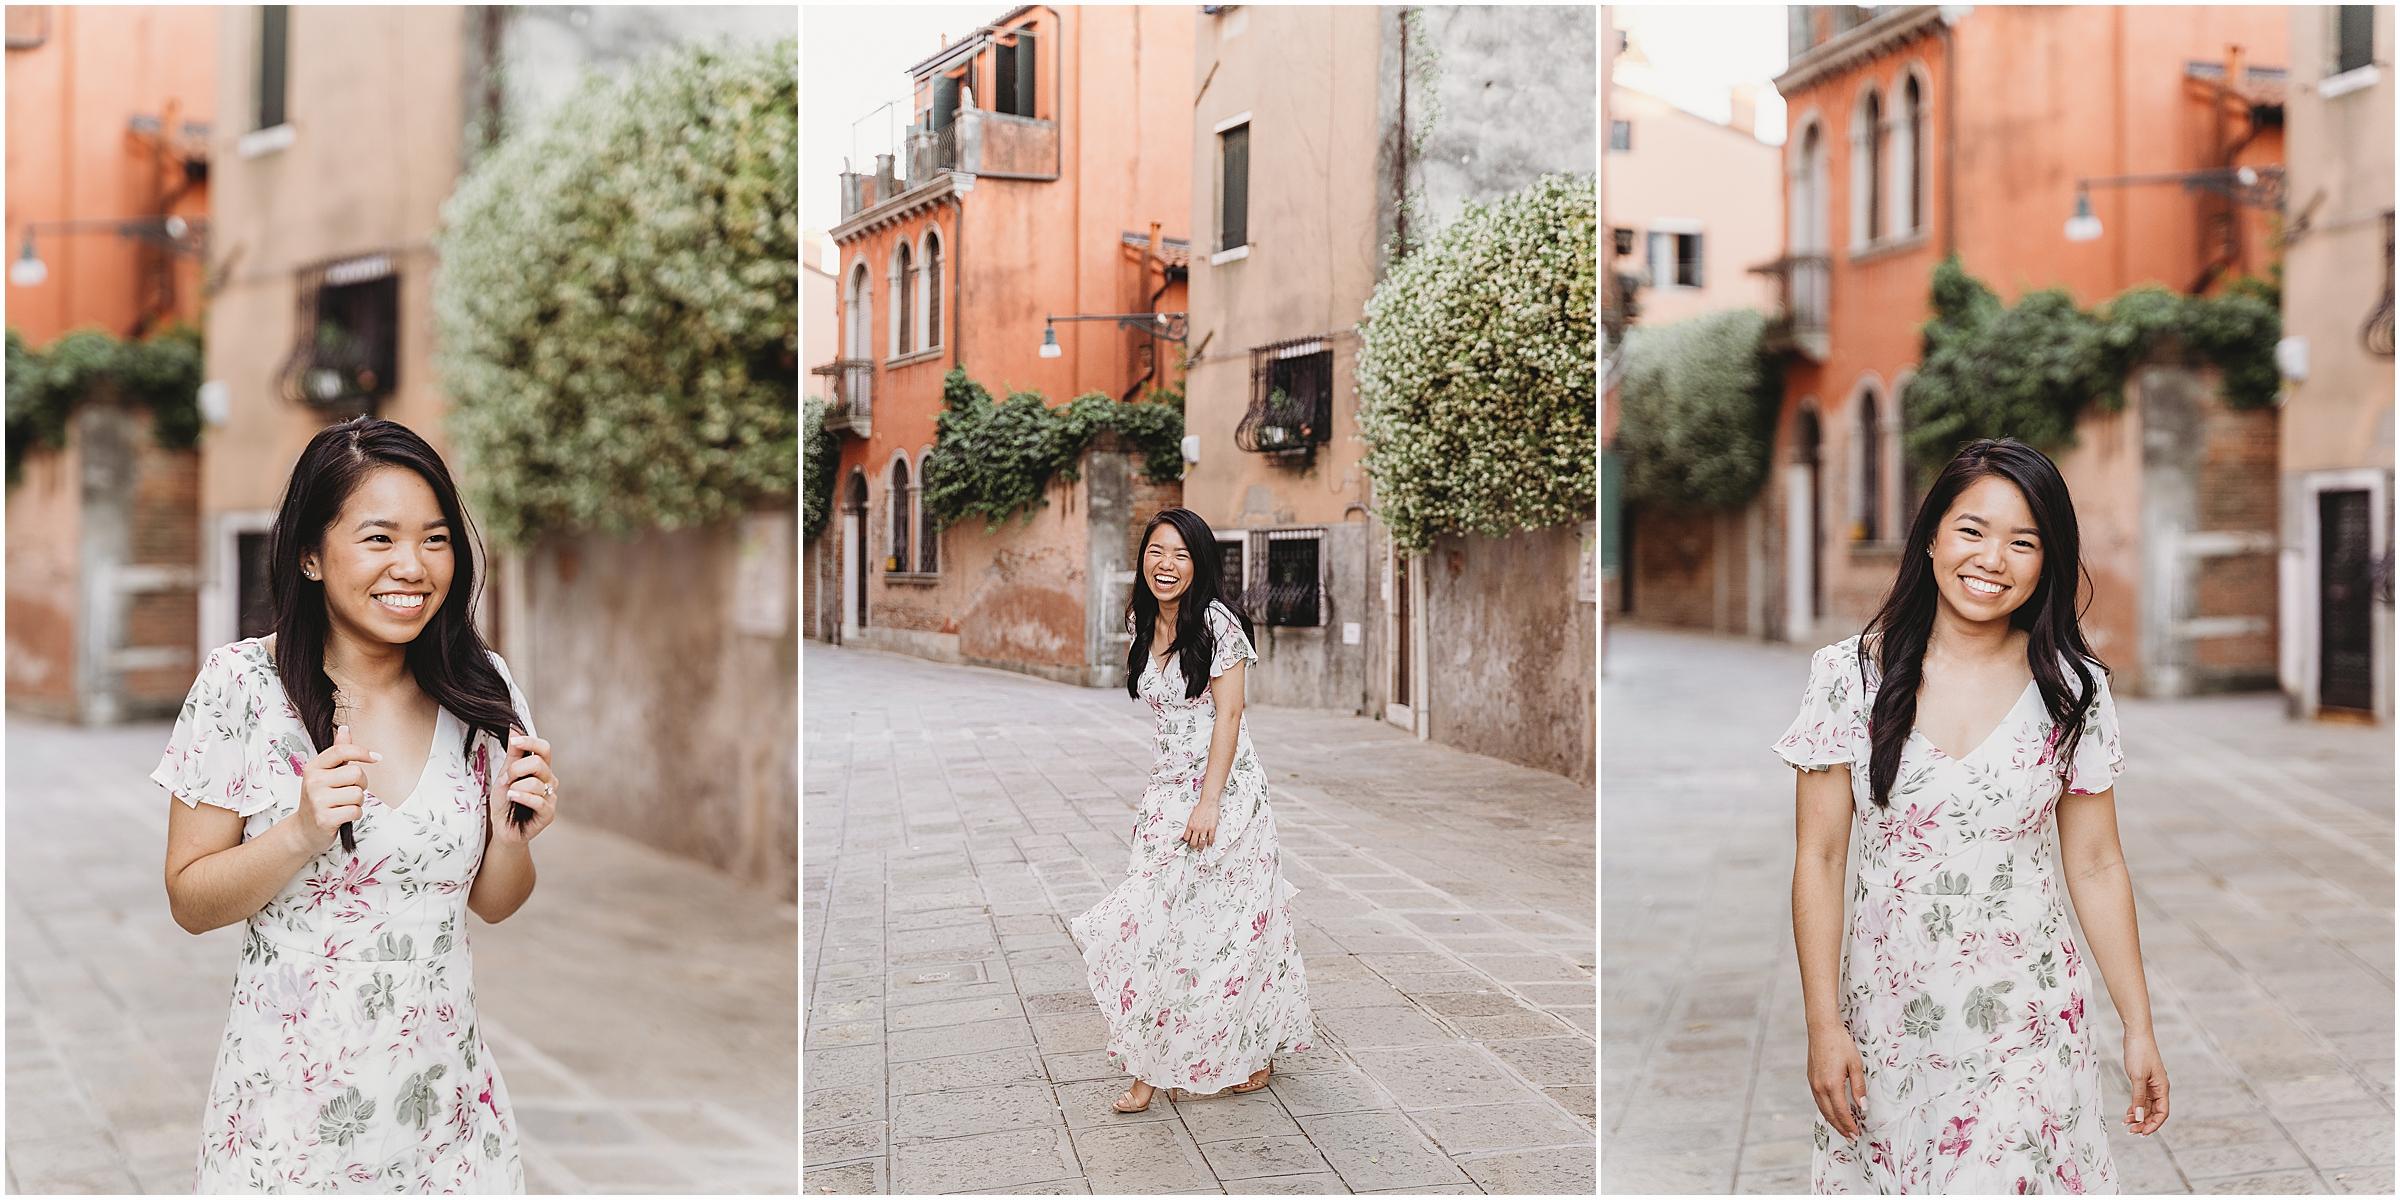 photographer-in-venice-elopement-shooting-Venice-couple_07.jpg